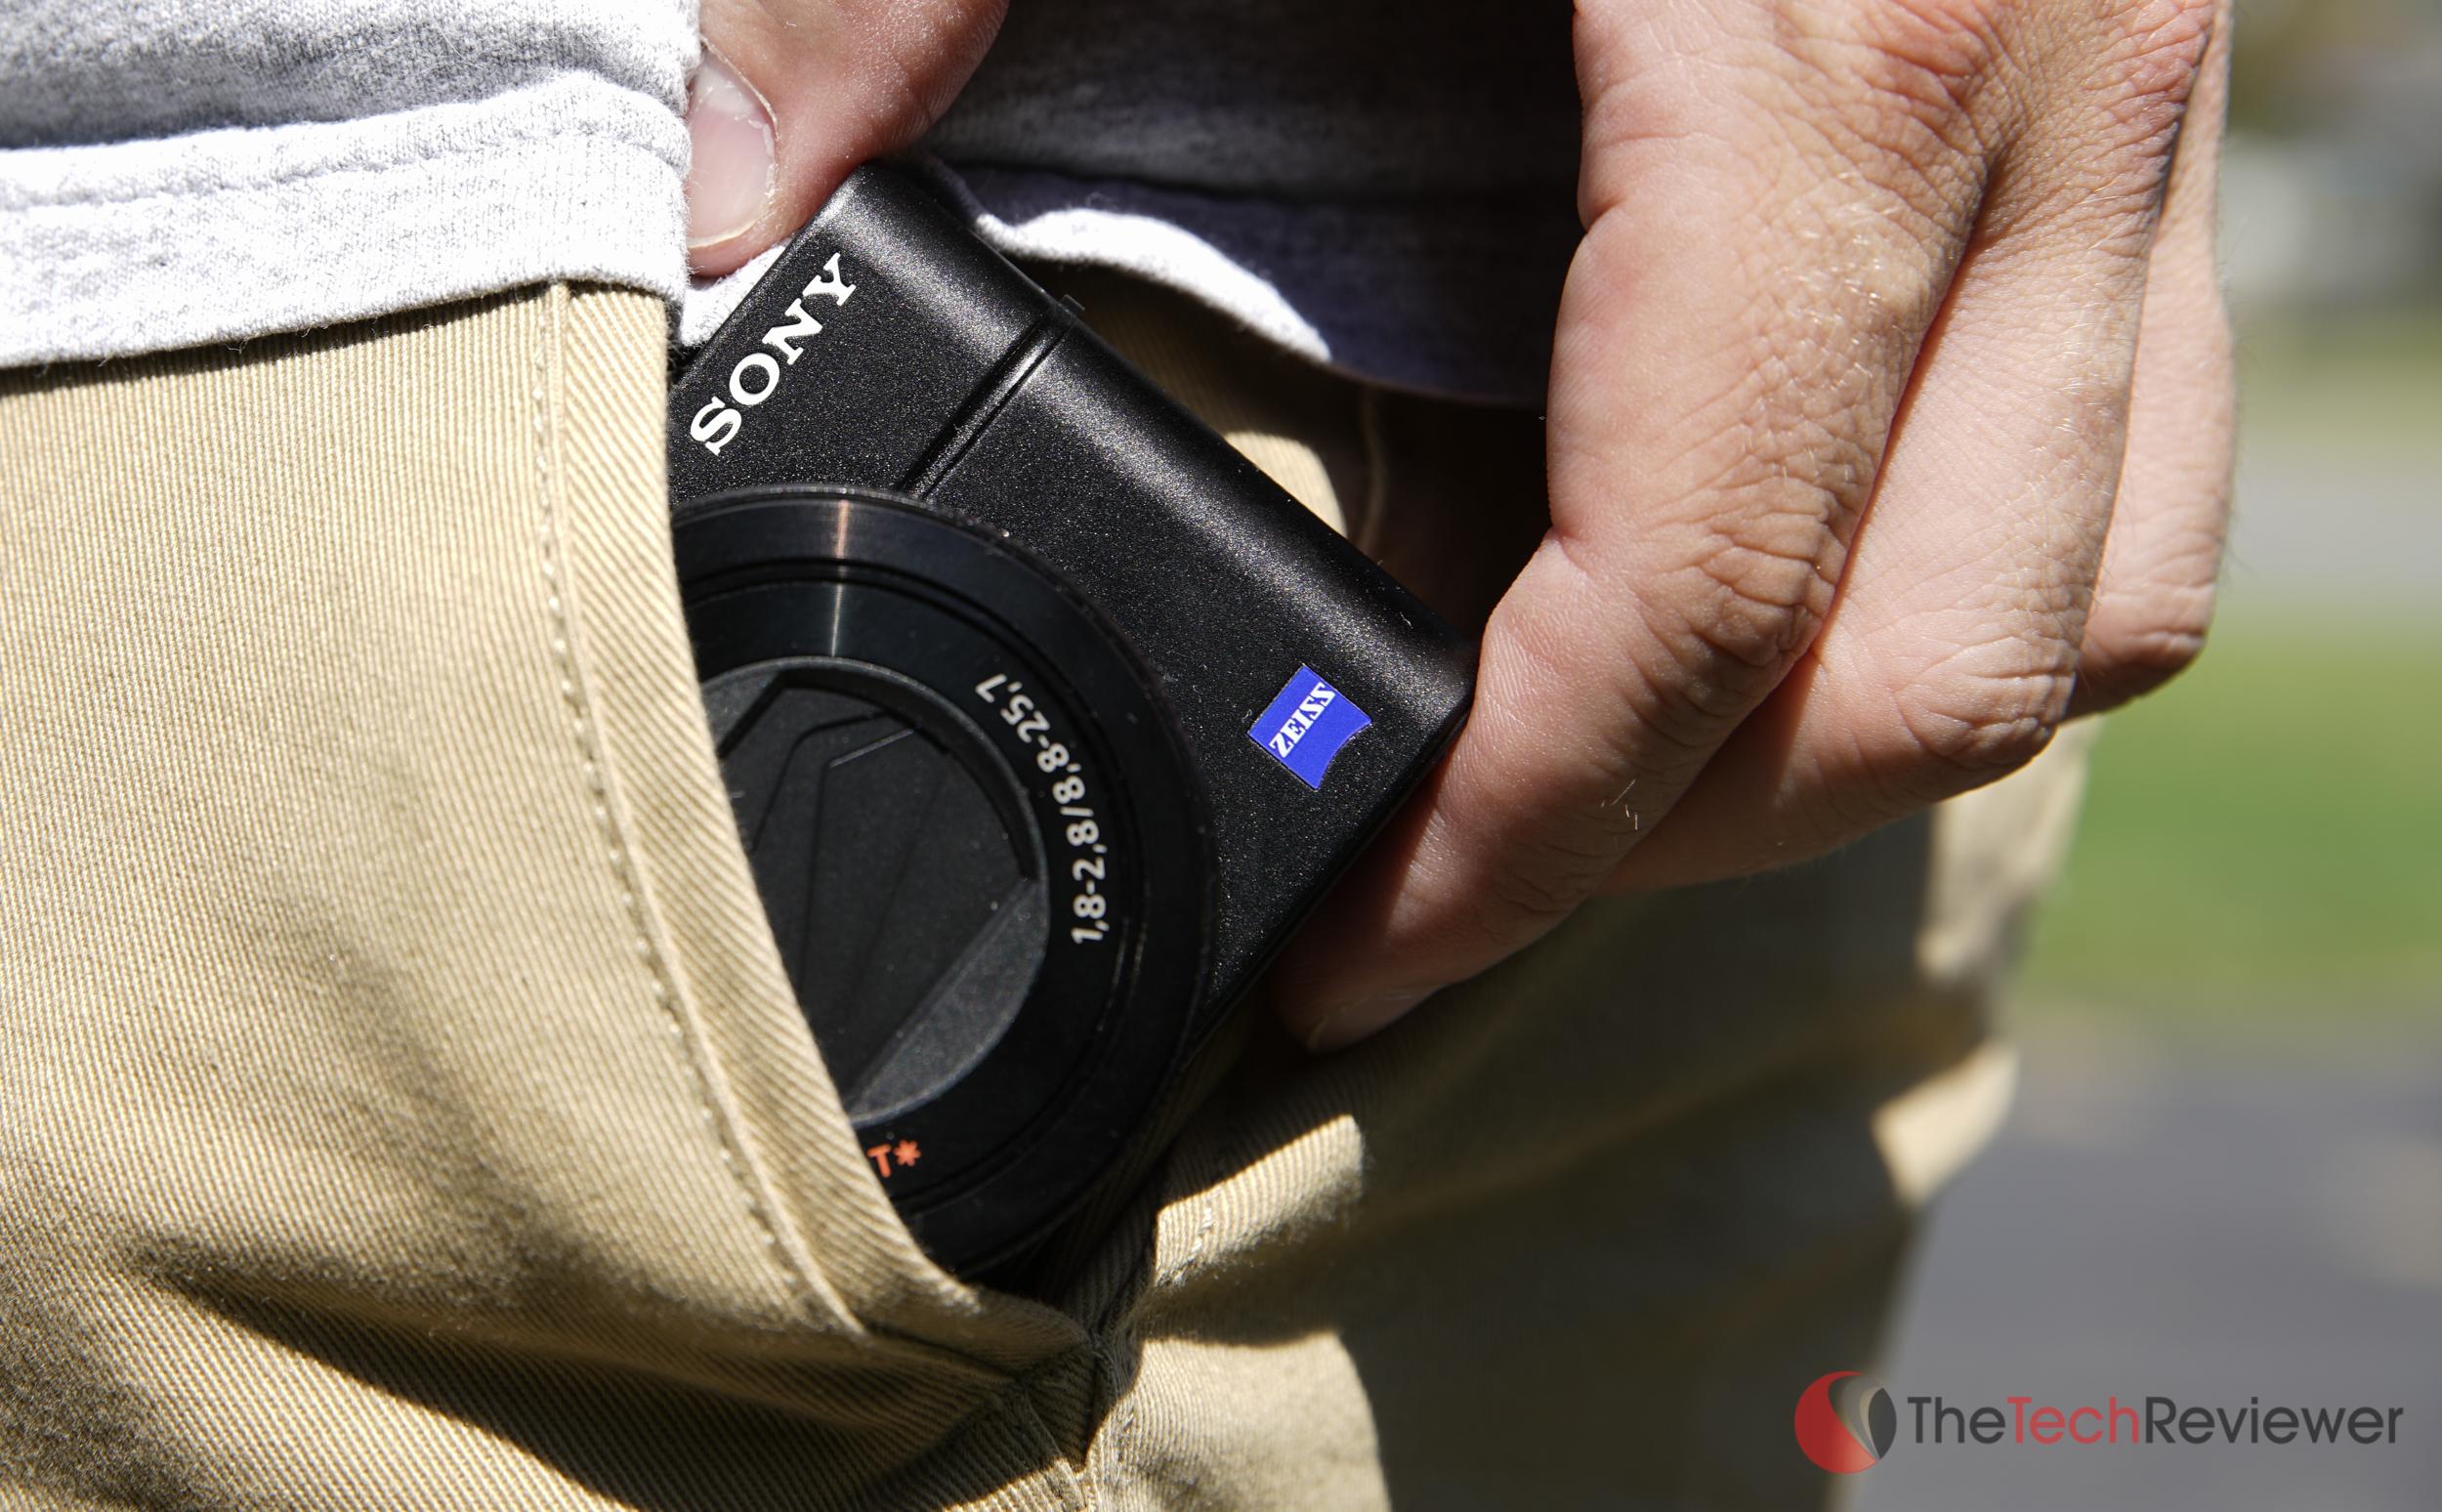 RX-100IV Product Shot